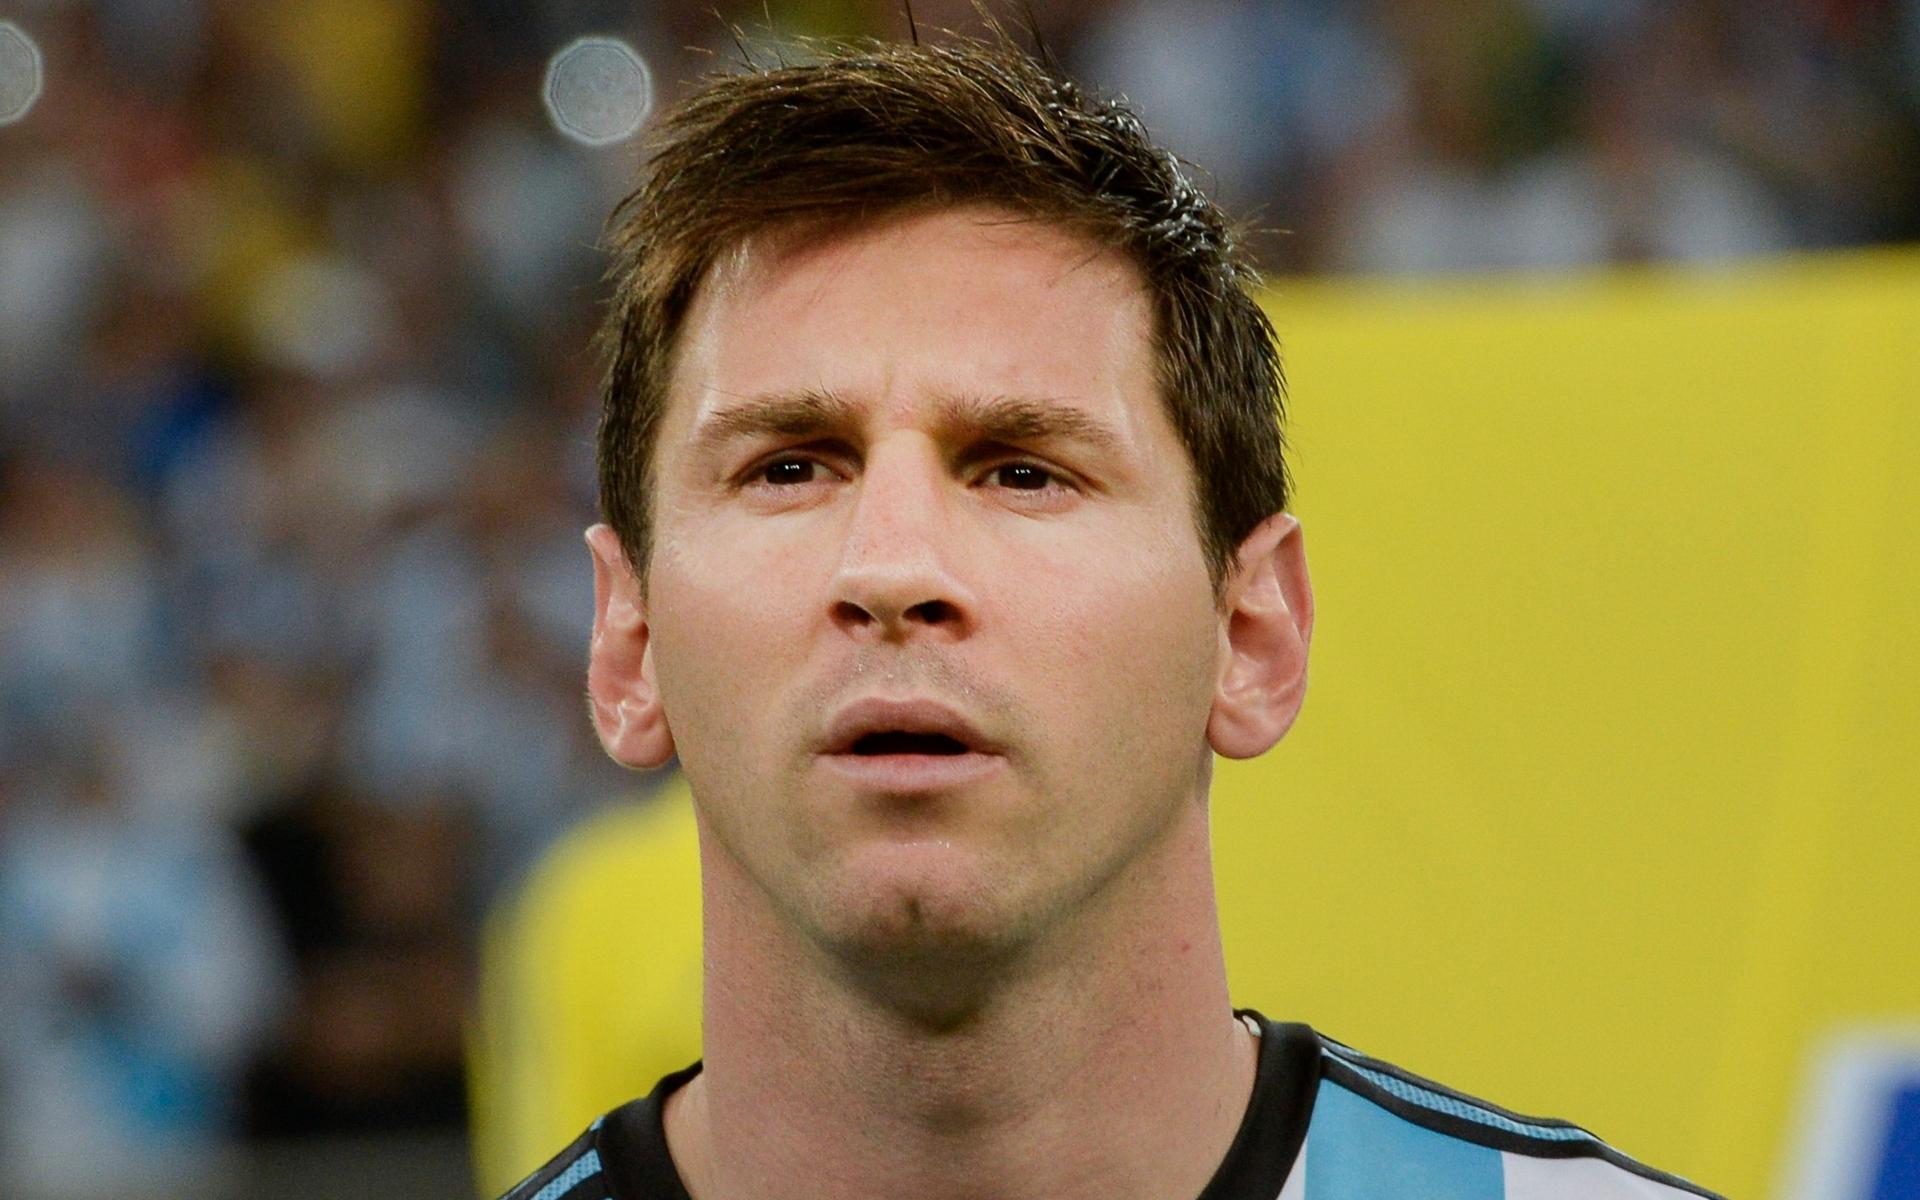 Messi - 1920x1200